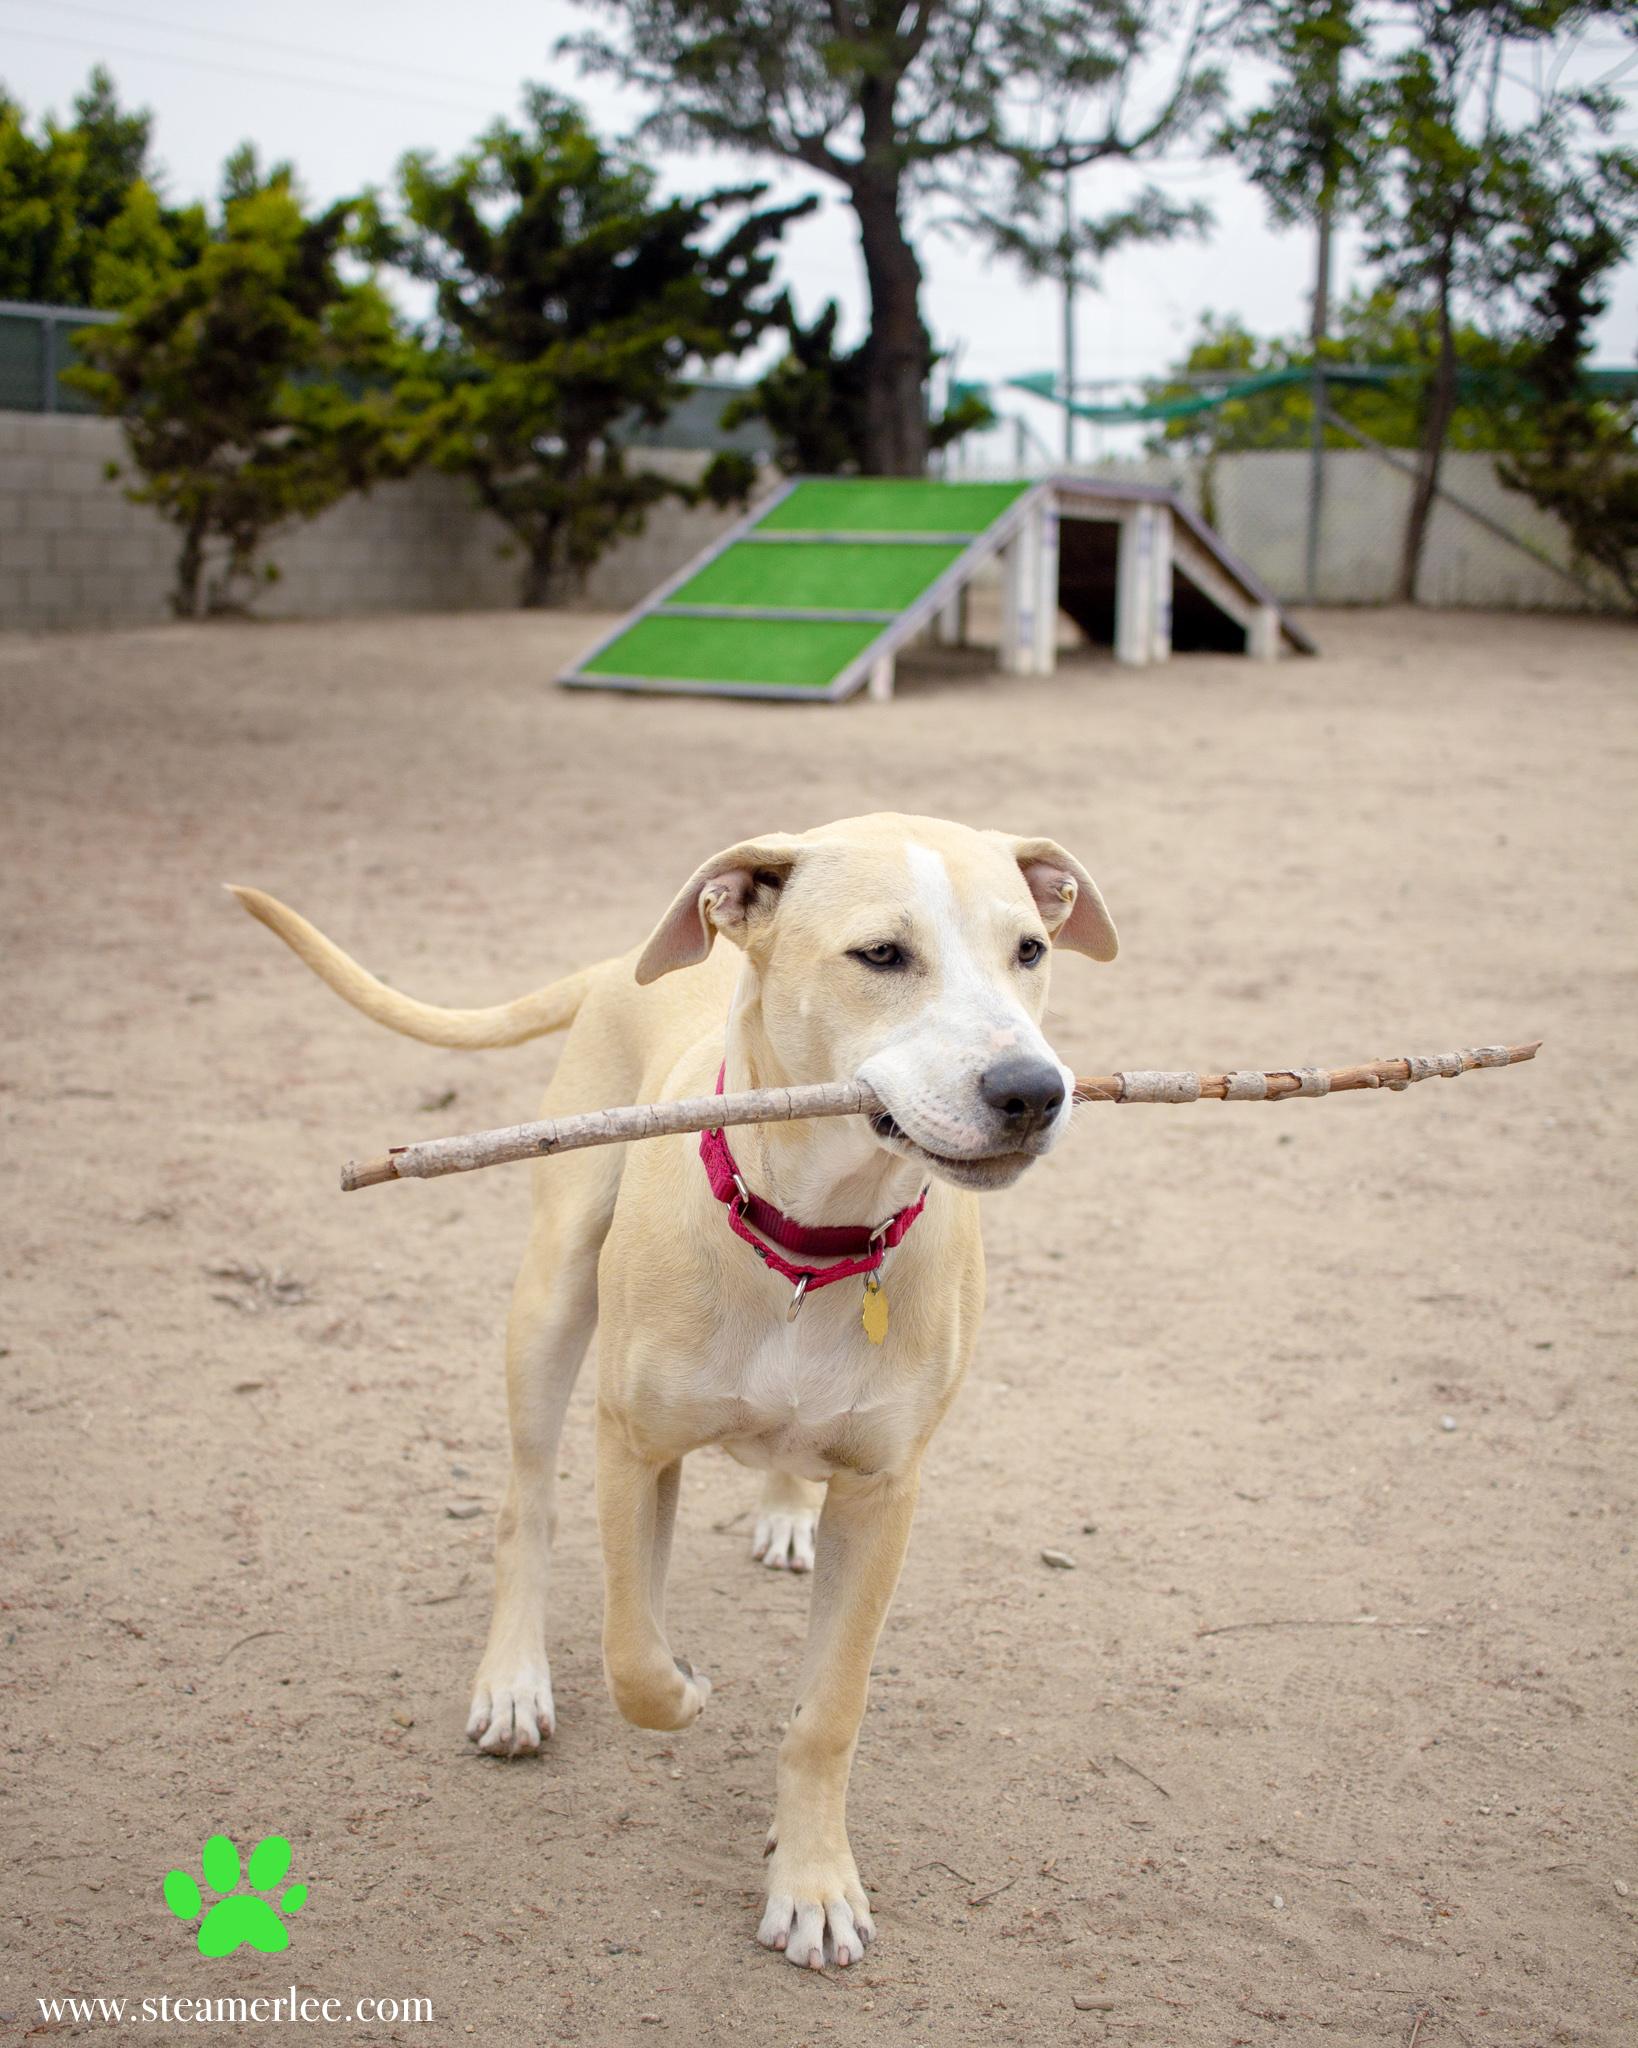 435-Orange-County-Dog-Photography-Steamer-Lee-Southern-California-SBACC.JPG